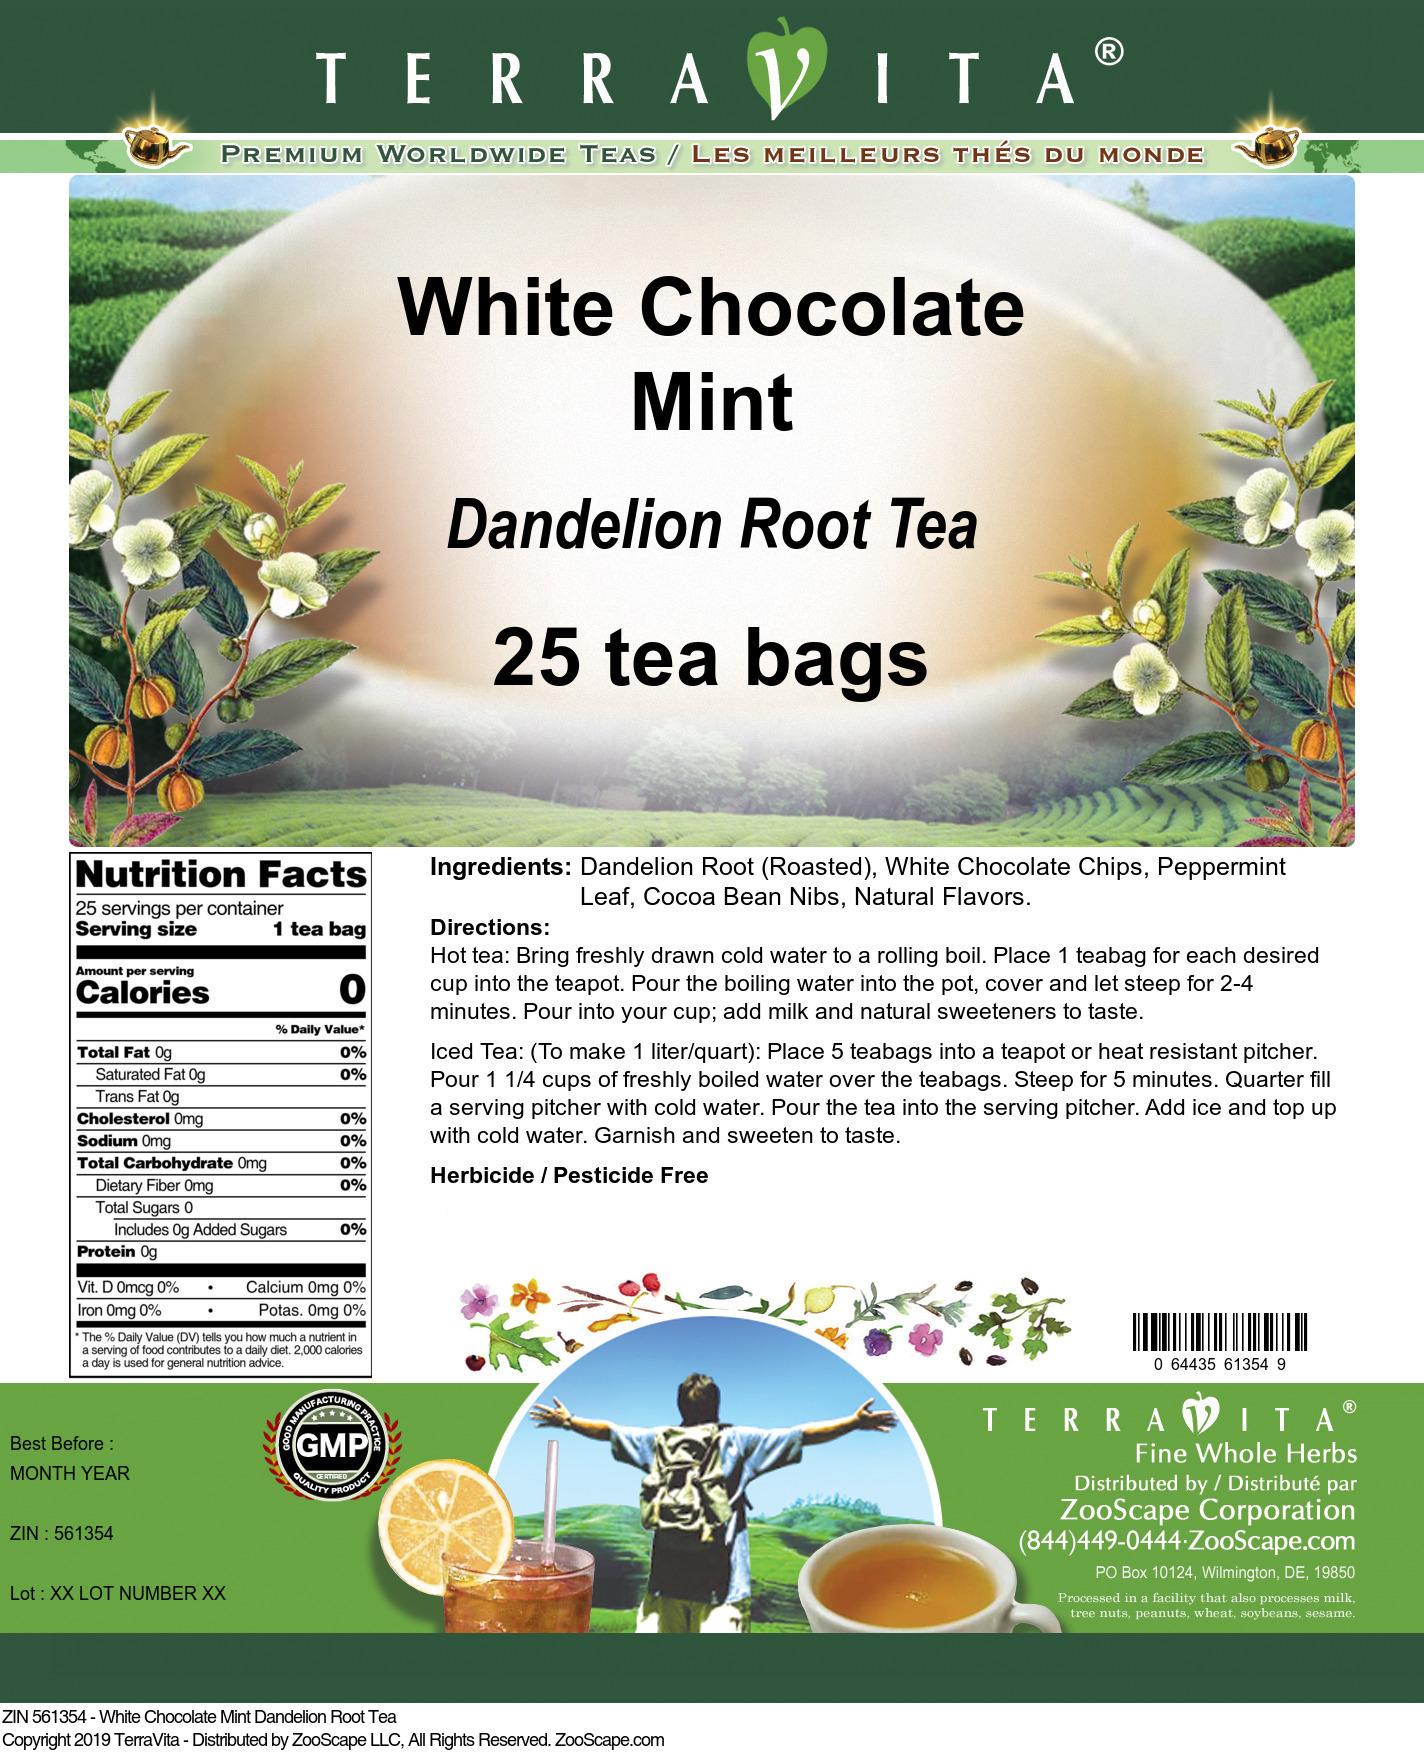 White Chocolate Mint Dandelion Root